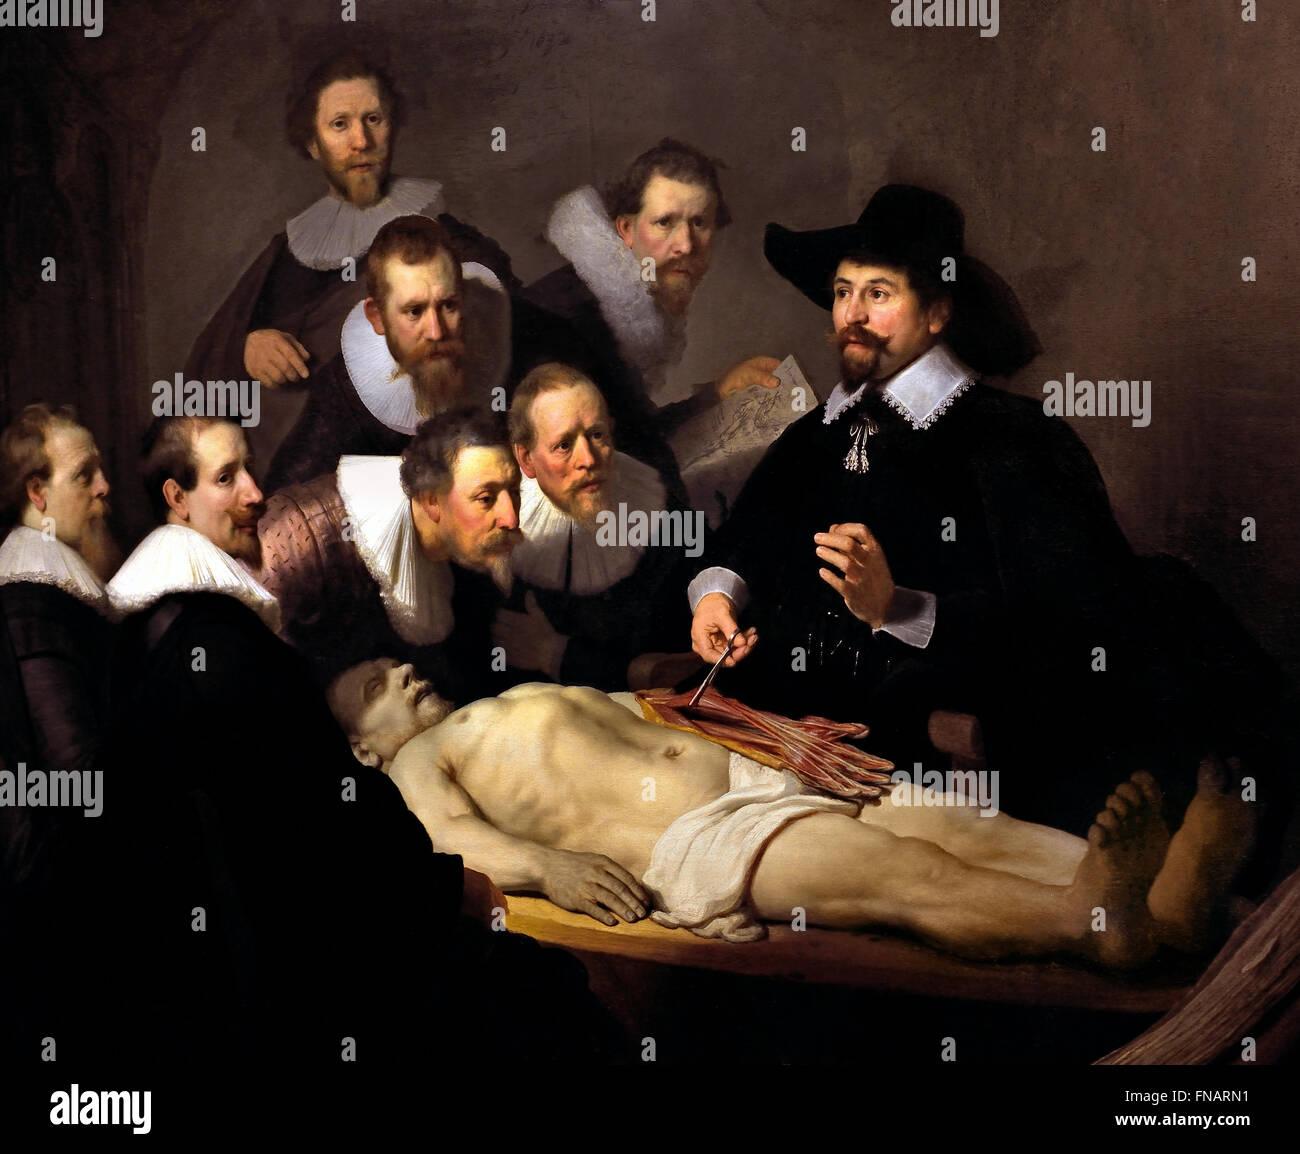 The Anatomy Lesson De Anatomische Les Of Dr Nicolaes Tulp 1632